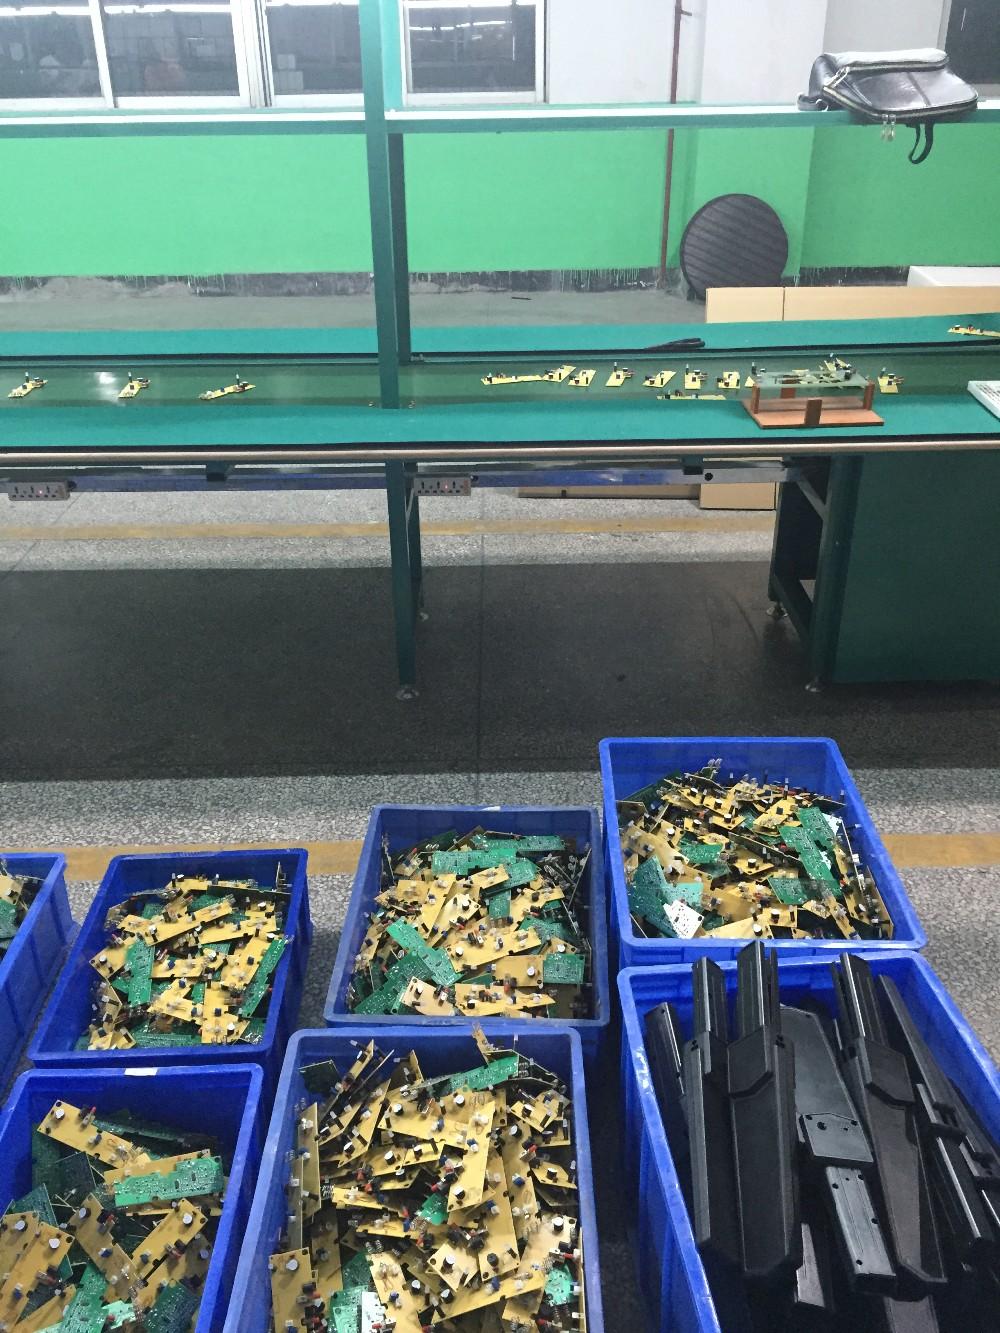 Security metal detector school - School Examination Room Important Place Hand Held Metal Detector Security Metal Detectors For Human